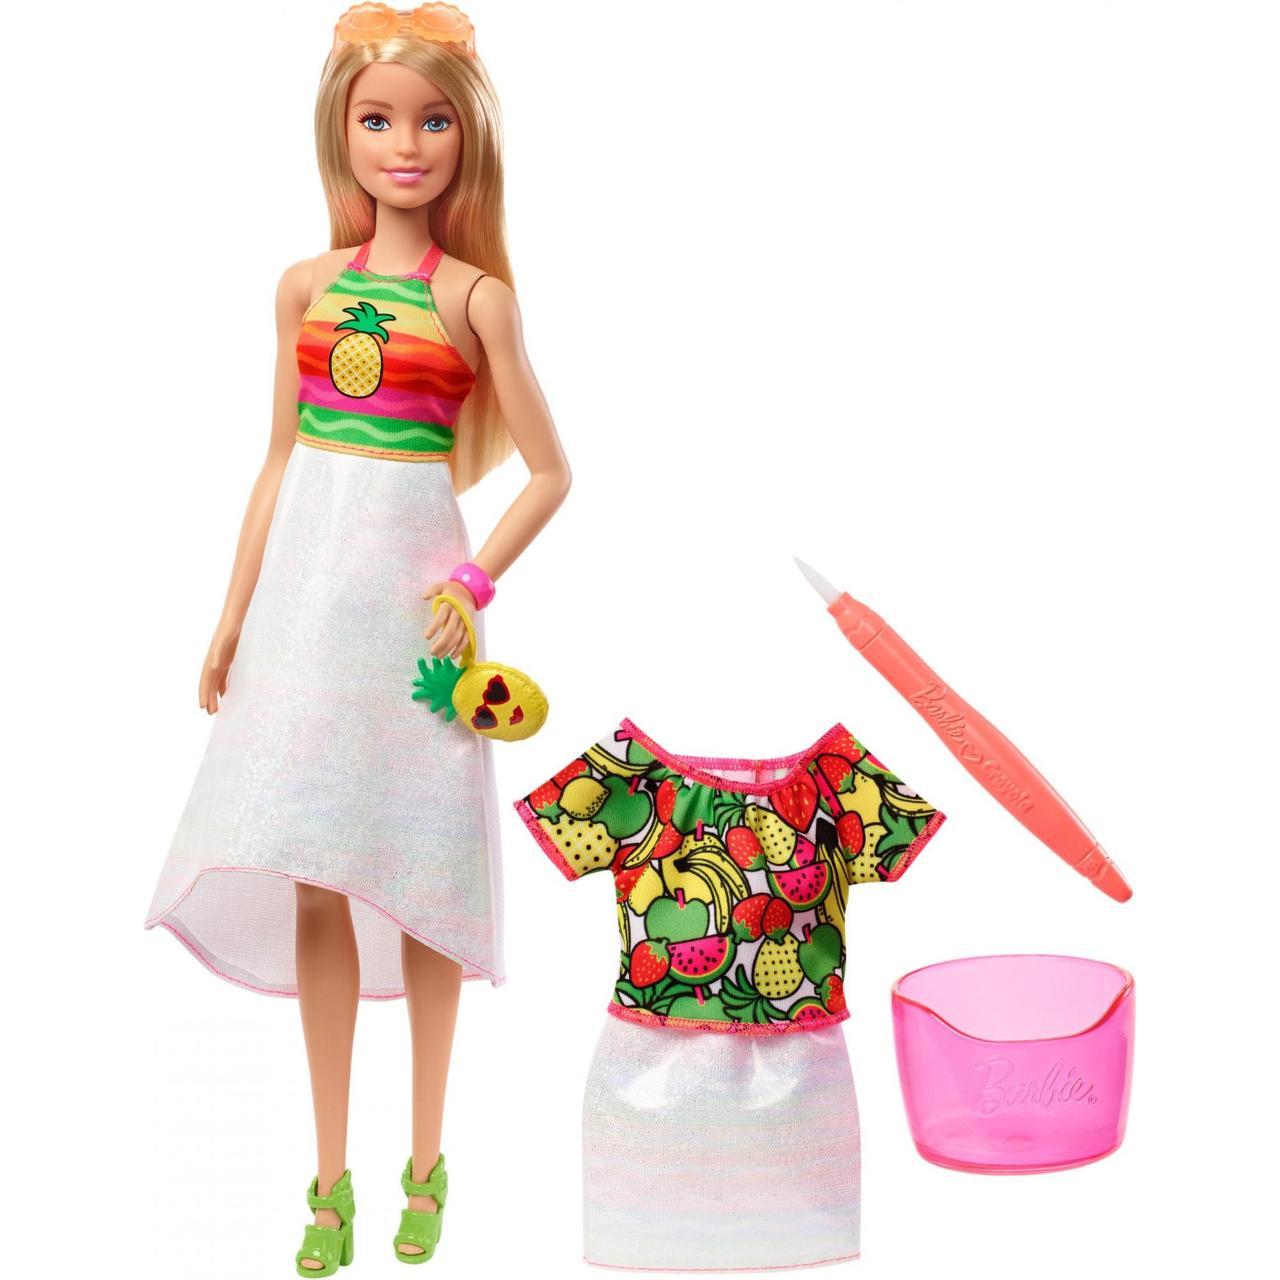 Лялька Барбі Крайола Фруктовий сюрприз Barbie Crayola Rainbow Fruit Surprise, блондинка